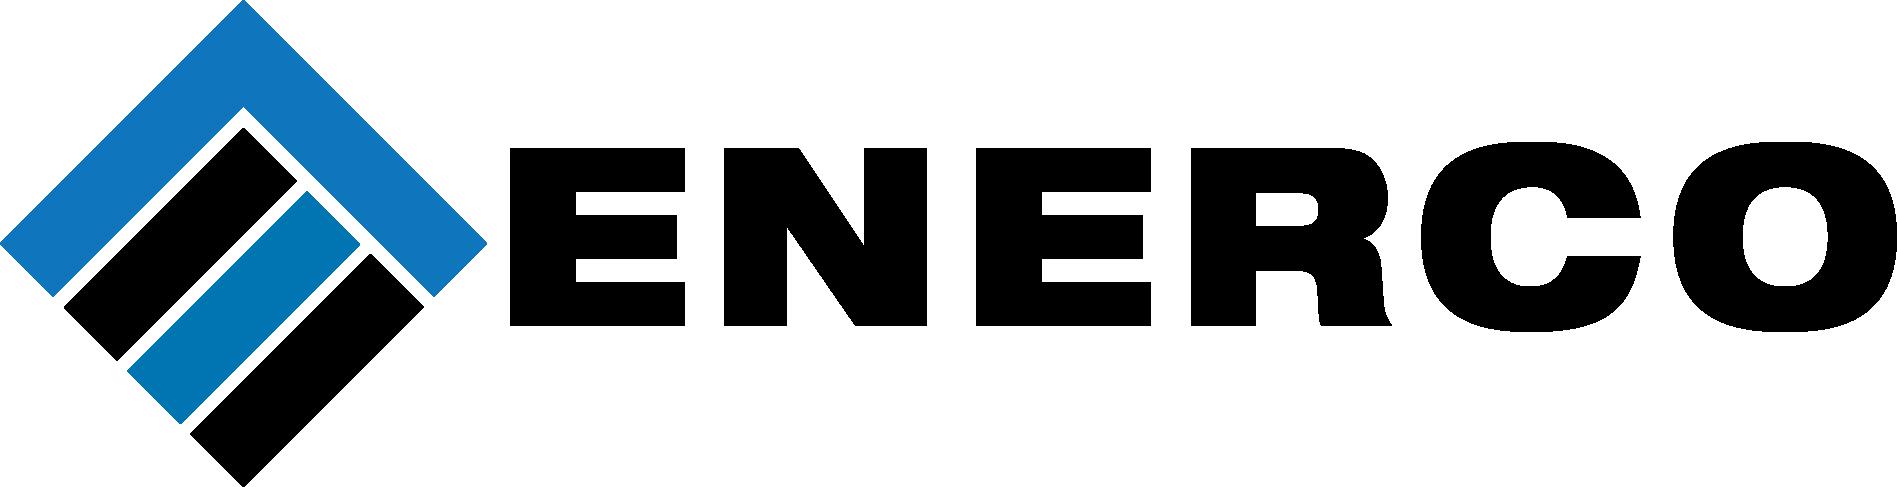 Propane Bulk Tank Adapter (Male POL x 1in20 Male Throwaway Cyl Threads) Bulk